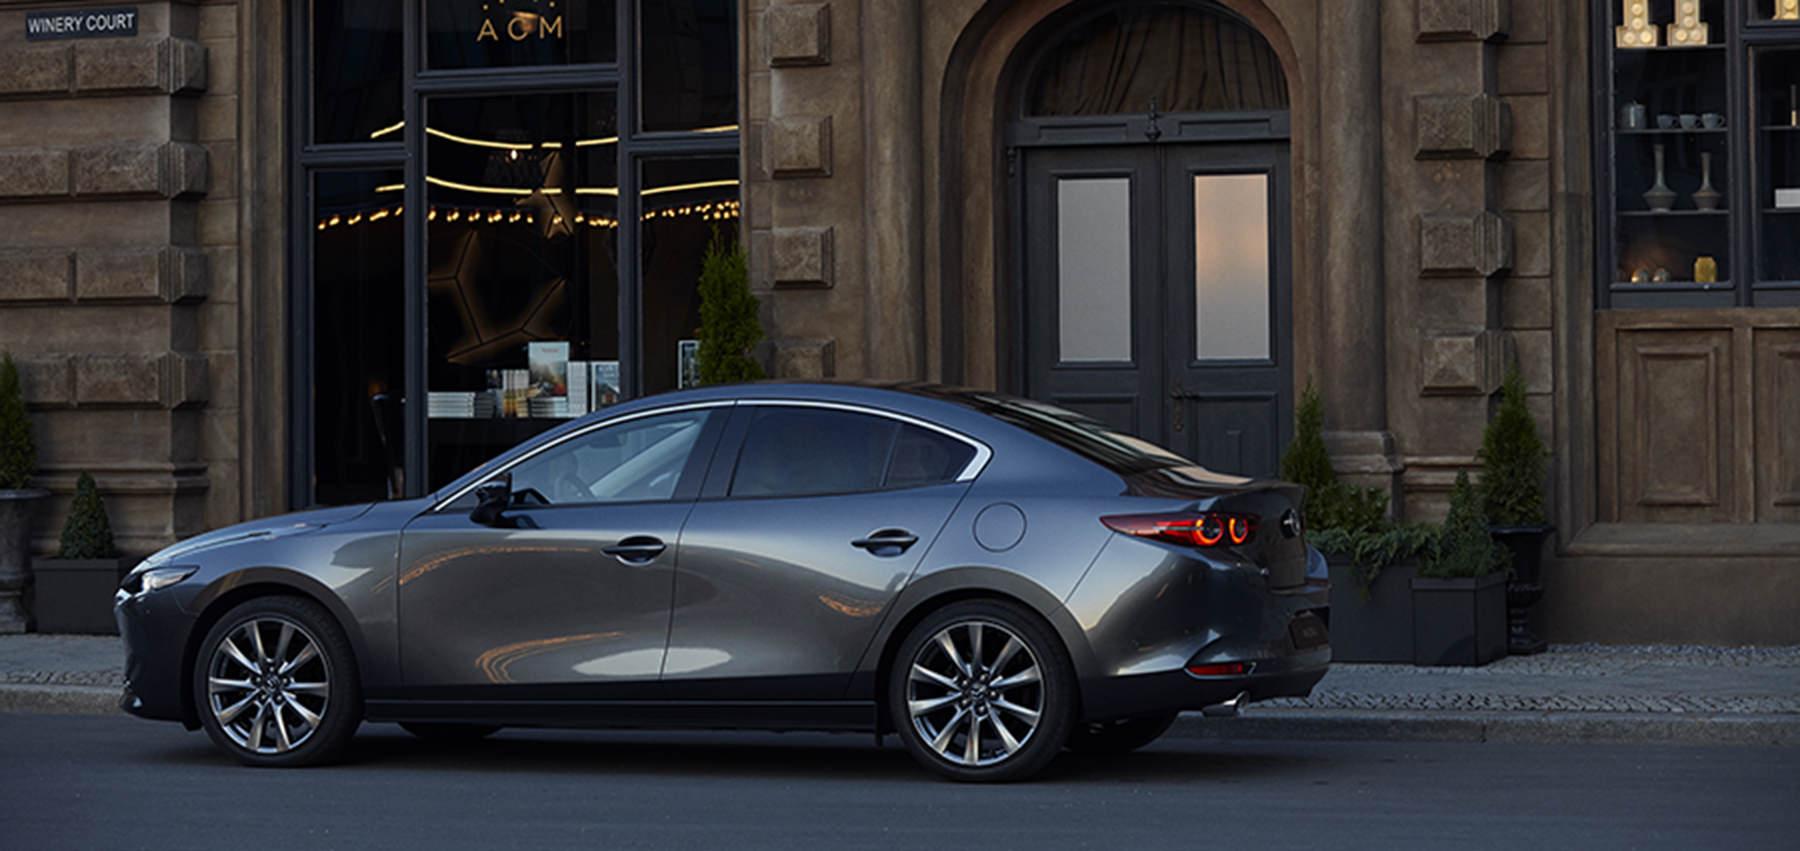 Mazda3 - Wikipedia | 851x1800